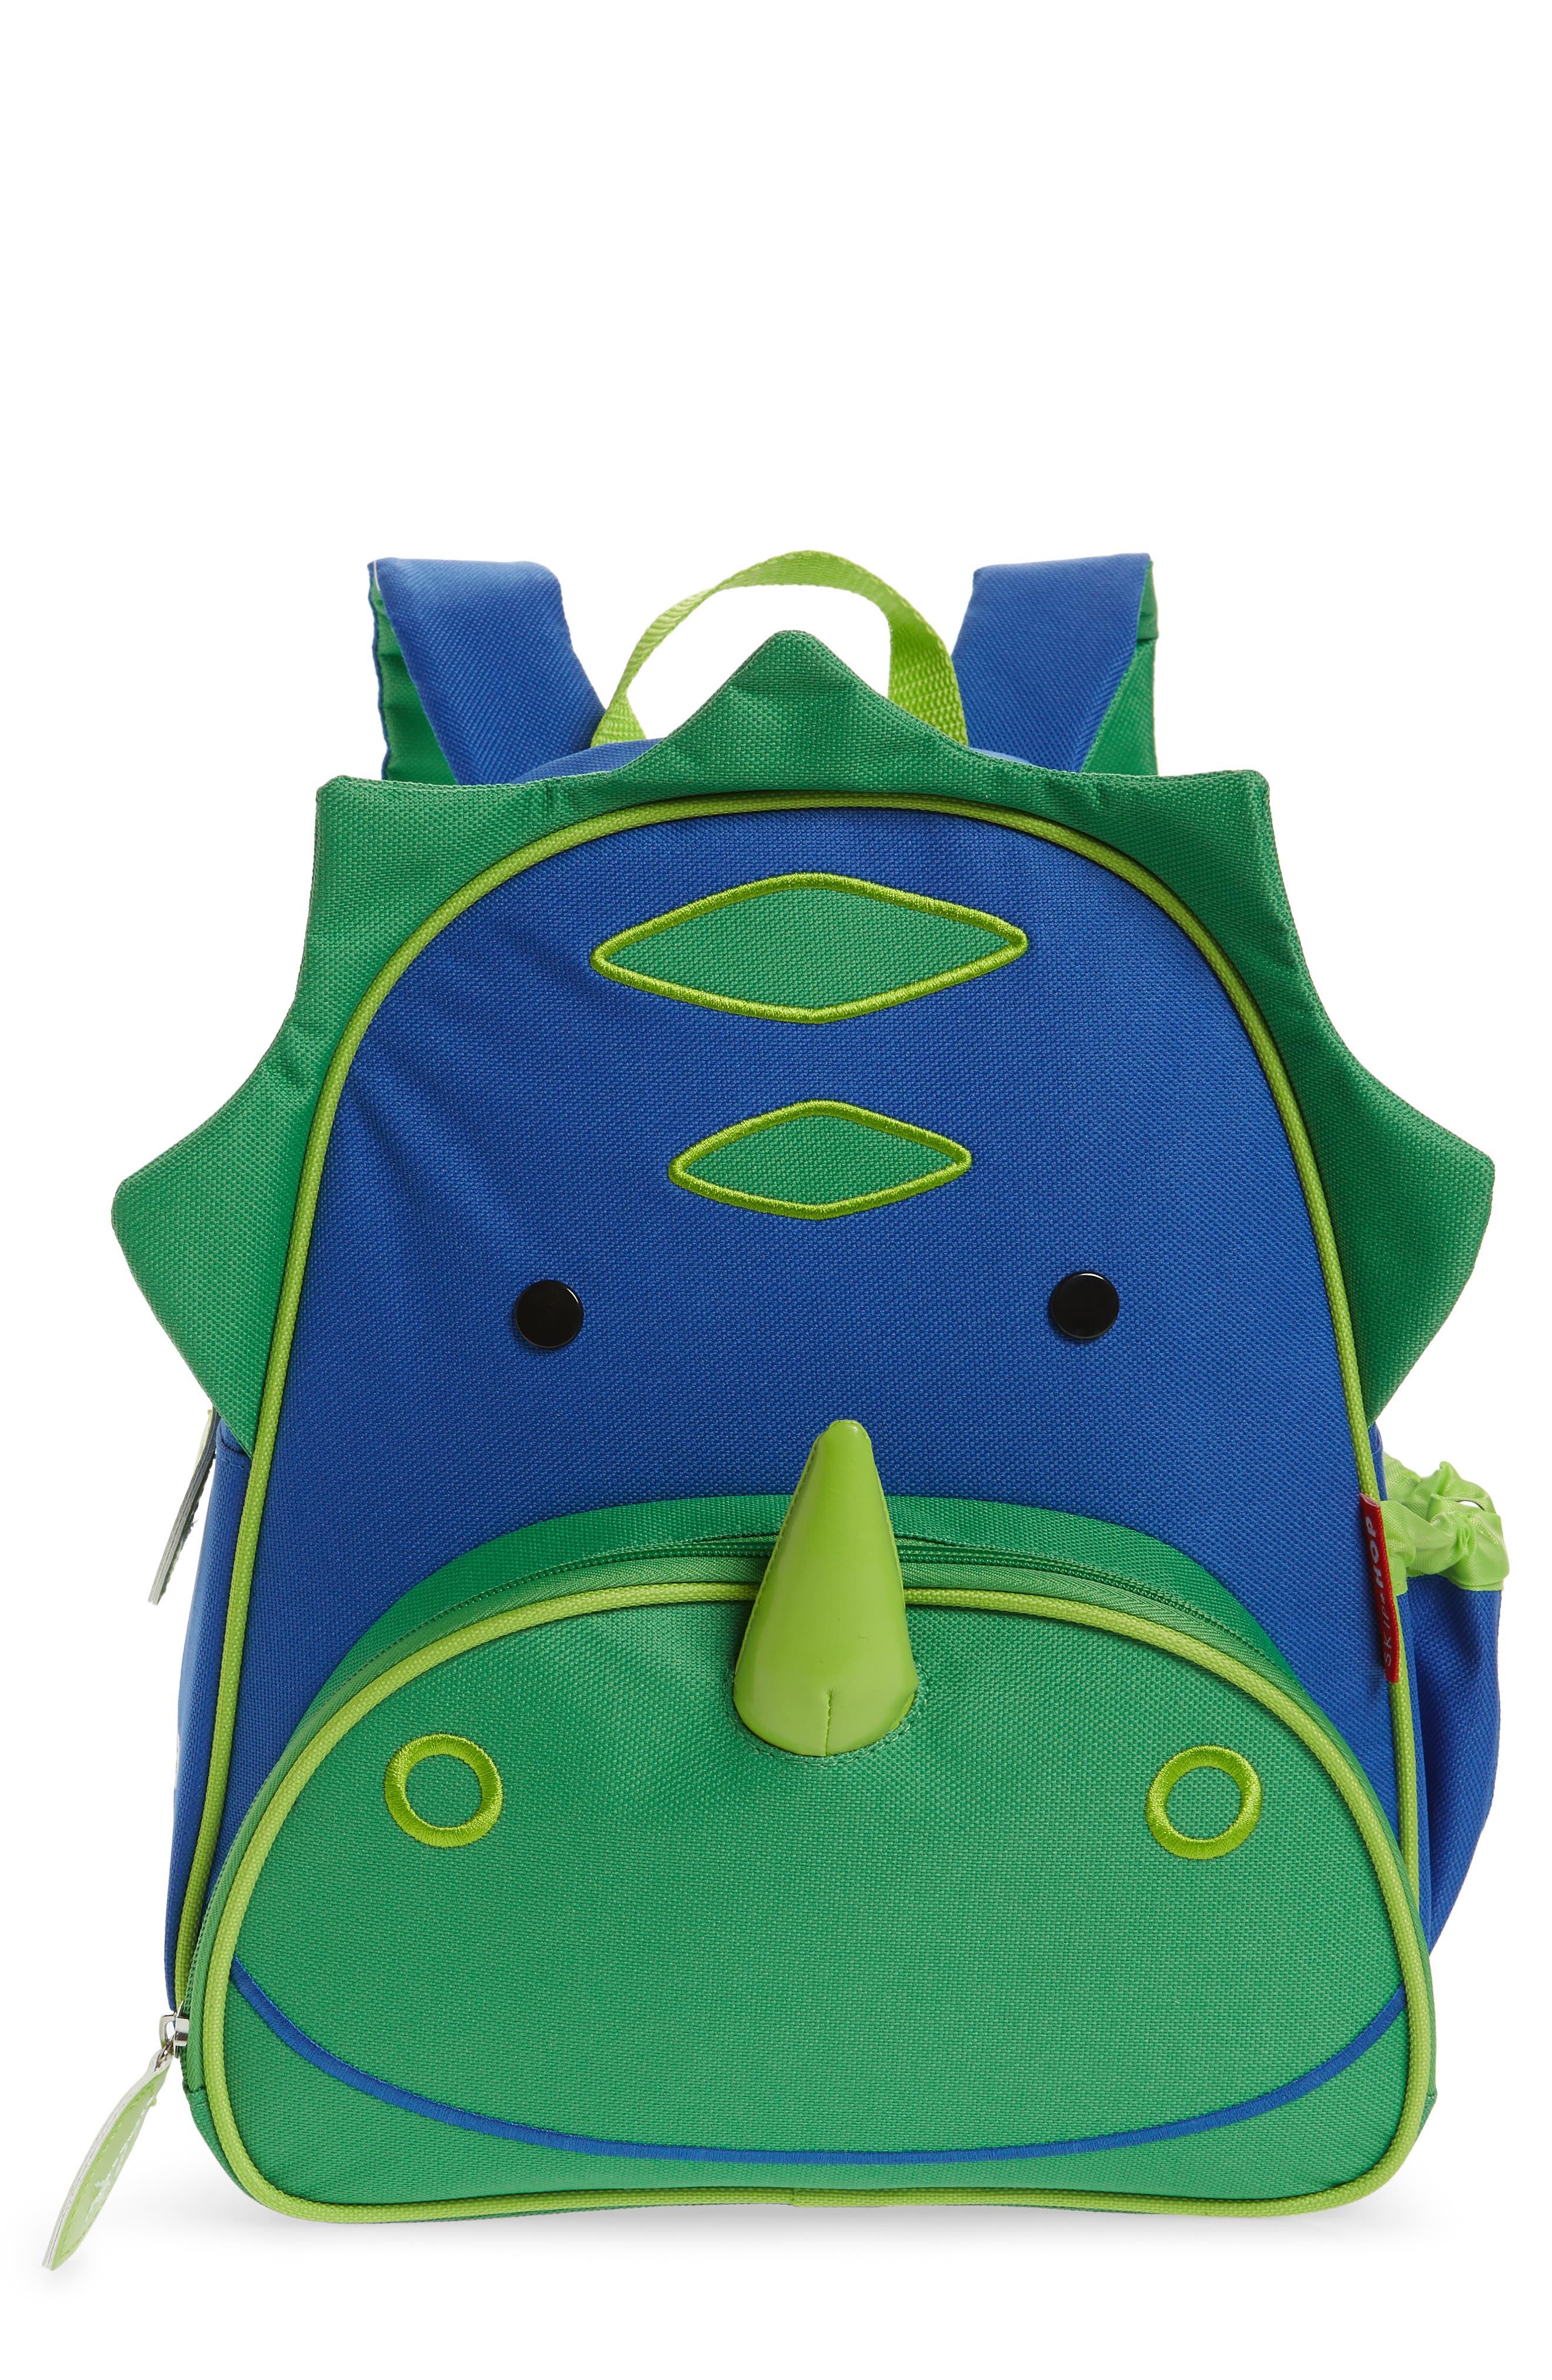 SKIP HOP, Zoo Pack Backpack, Main thumbnail 1, color, GREEN/ BLUE